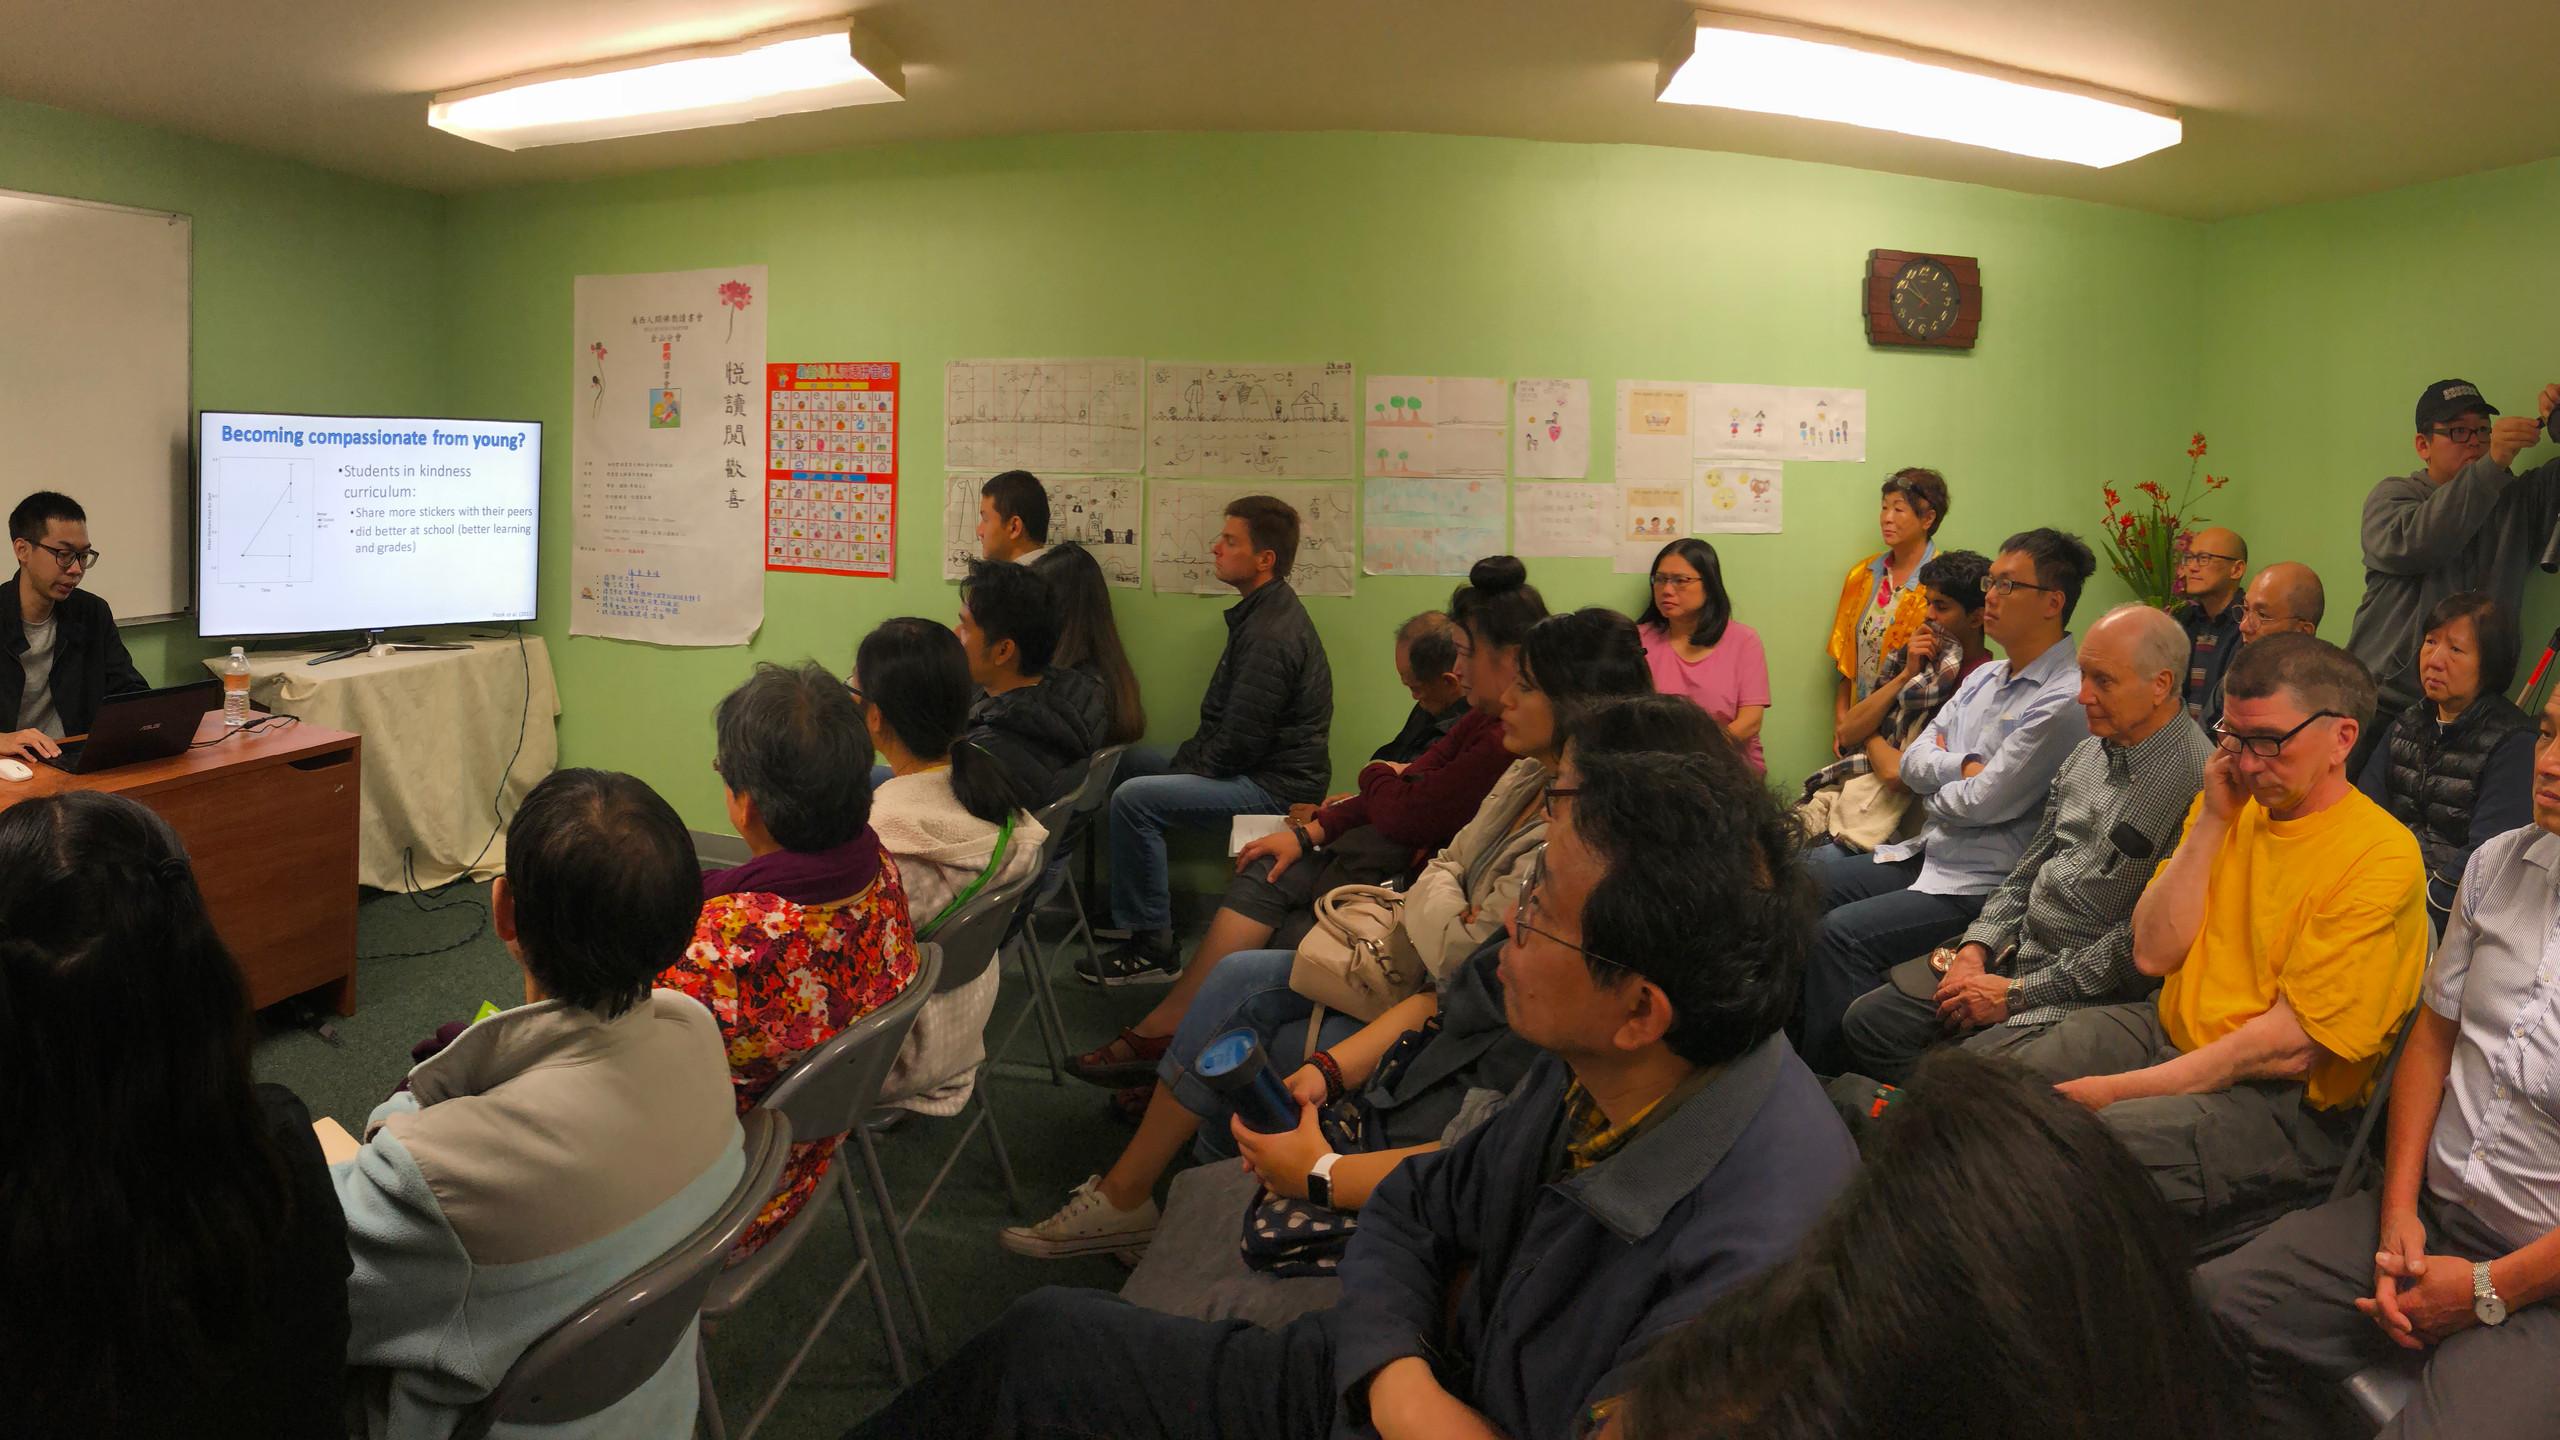 Winson Yang giving the talk